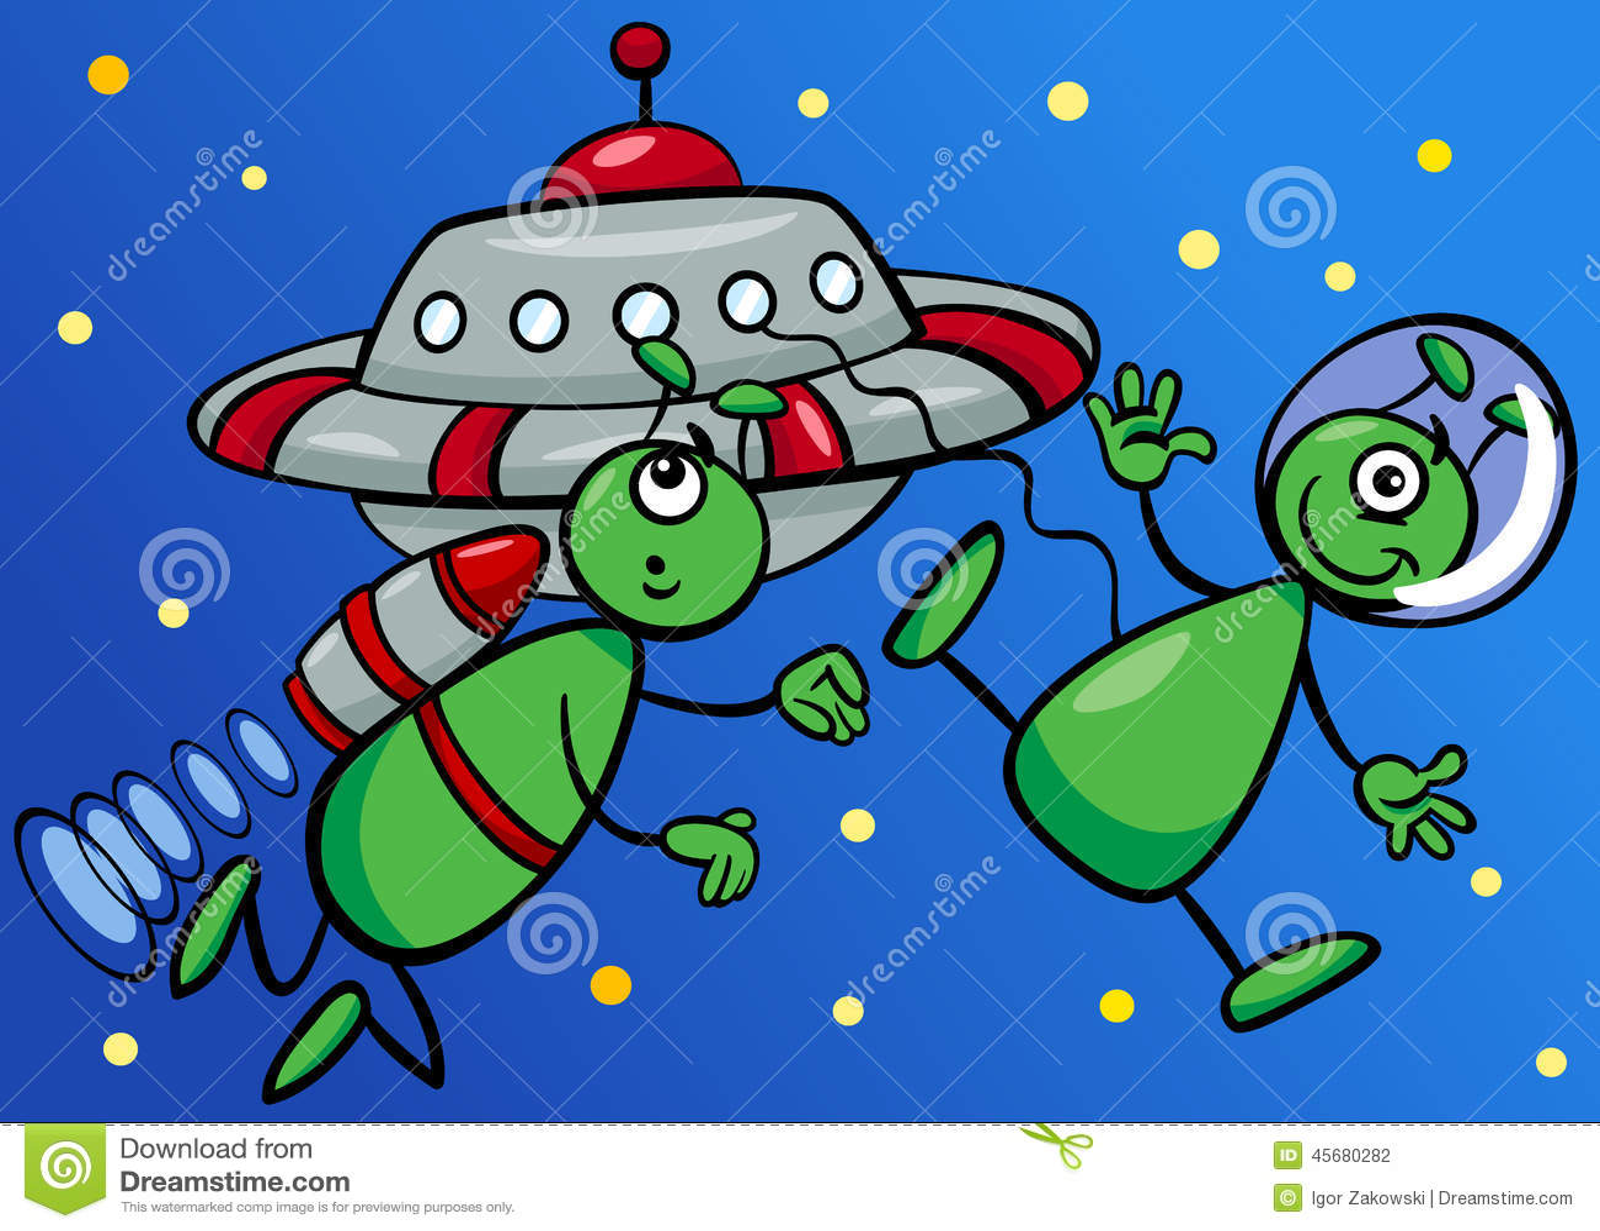 cartoon Space characters alien